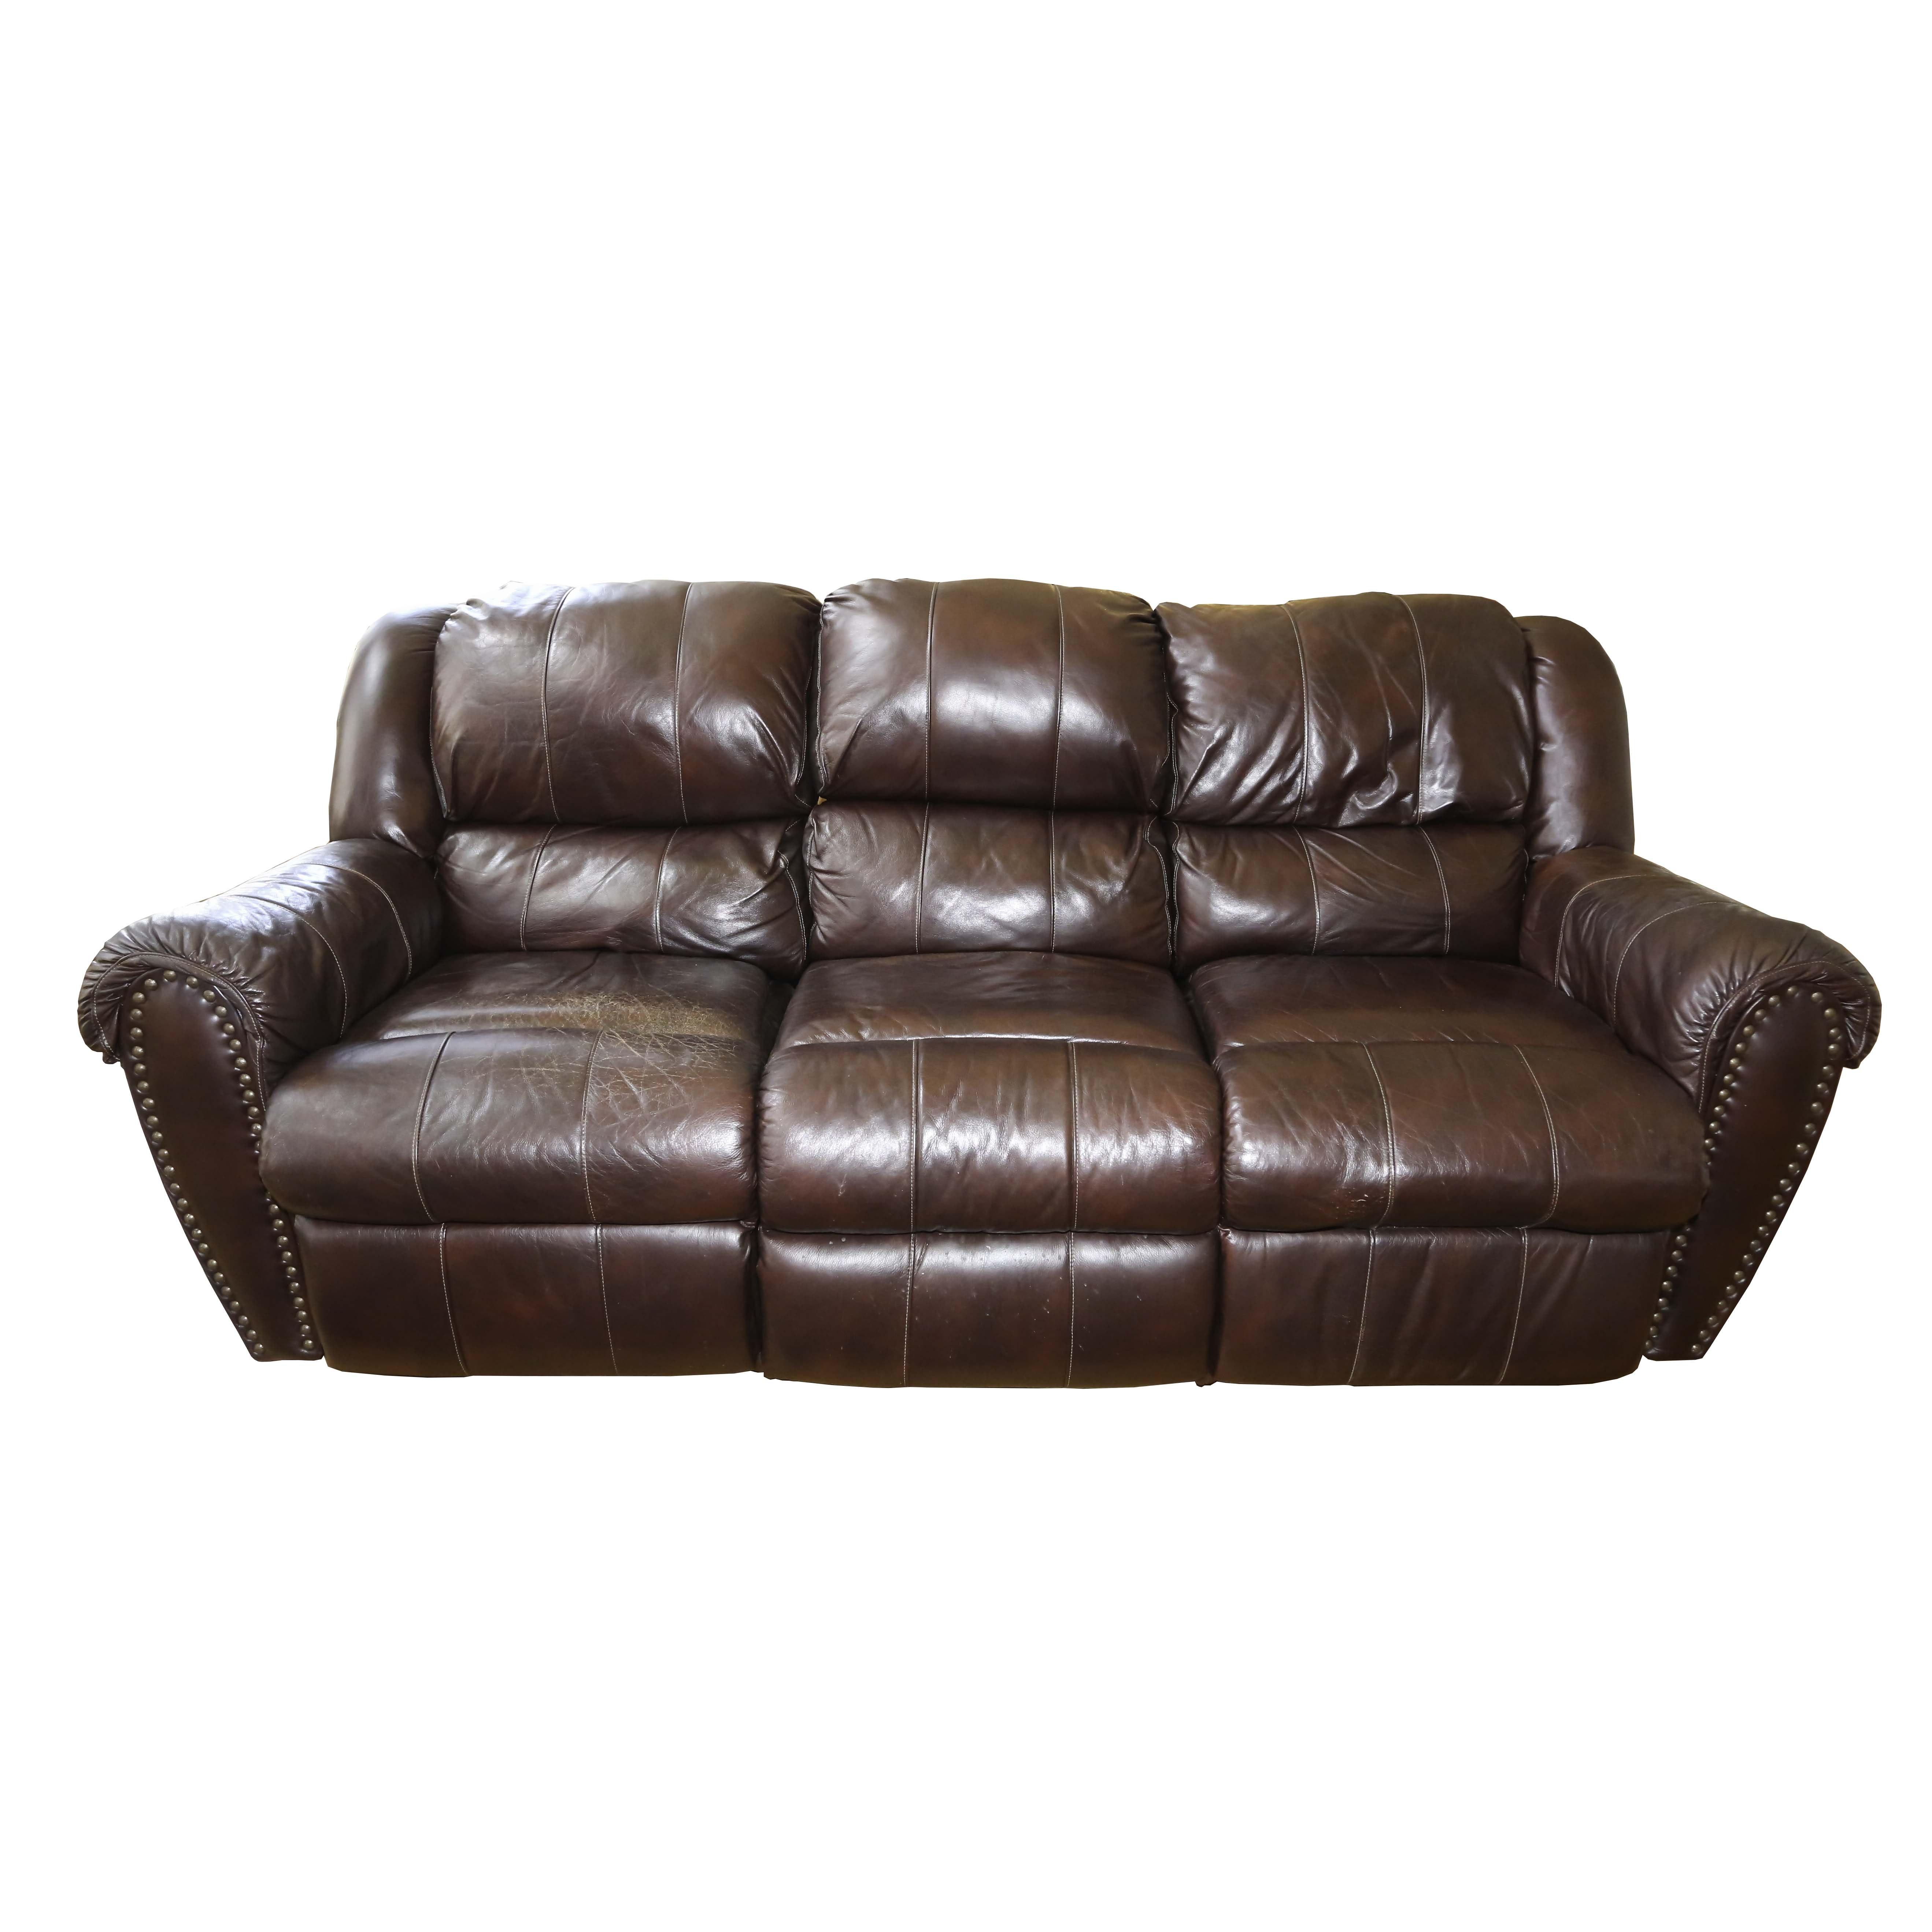 Walworth Reclining Leather Sofa